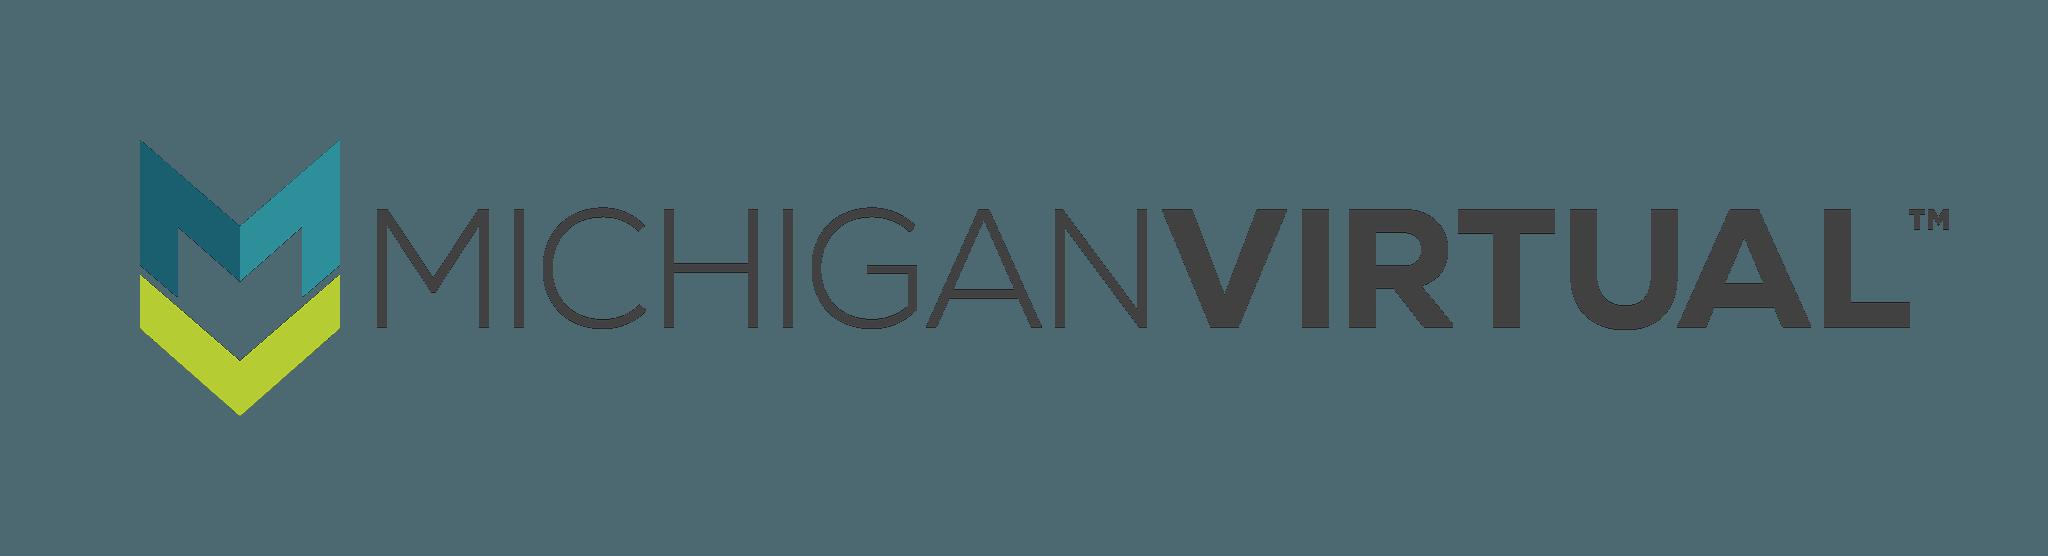 Michigan Virtual Logo (Horizontal)